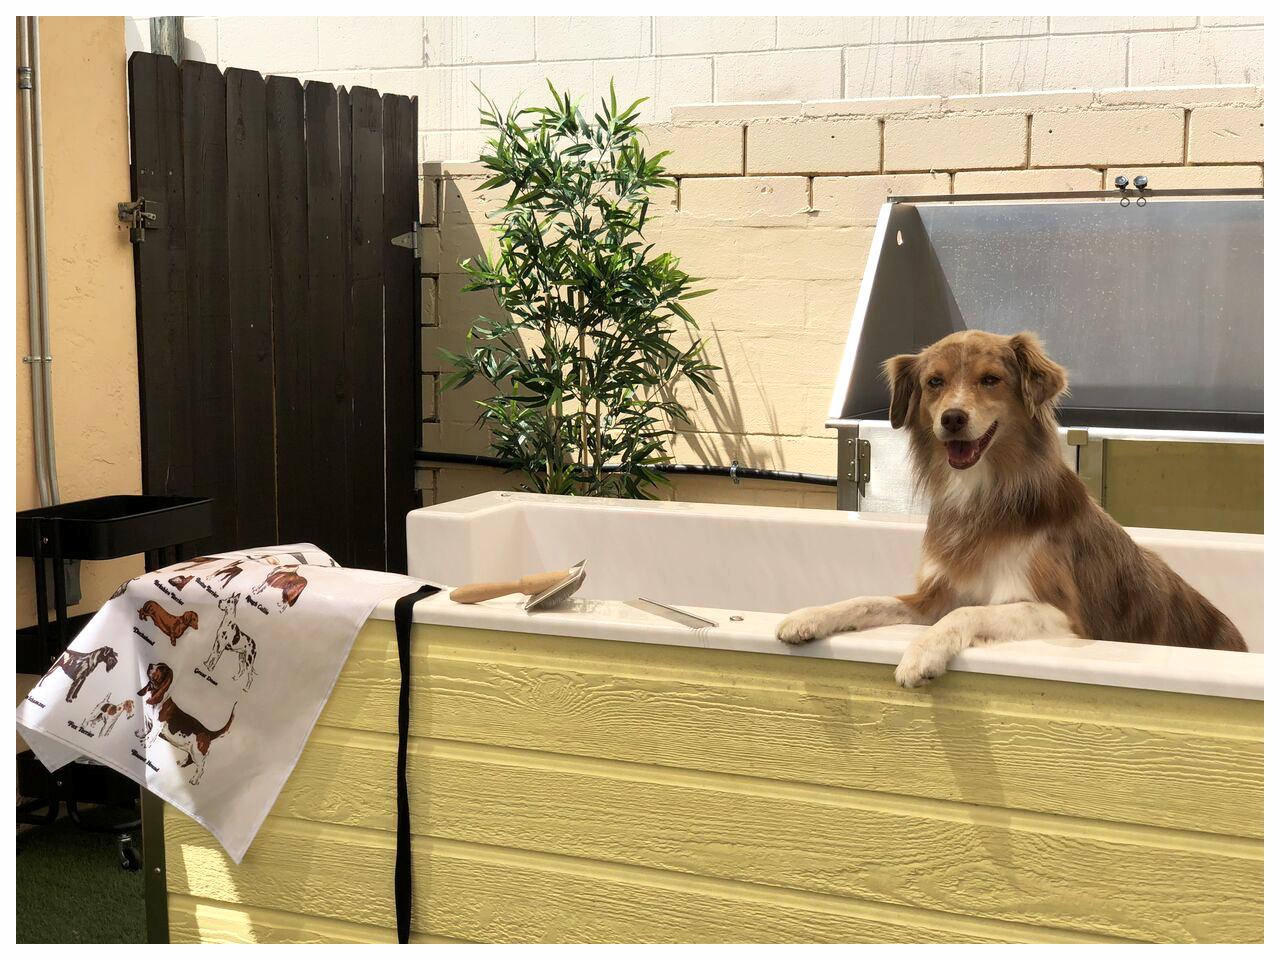 OUTDOOR SELF DOG WASH☆ - NEUGIER PET SHAMPOO + SOFT WATER SYSTEM